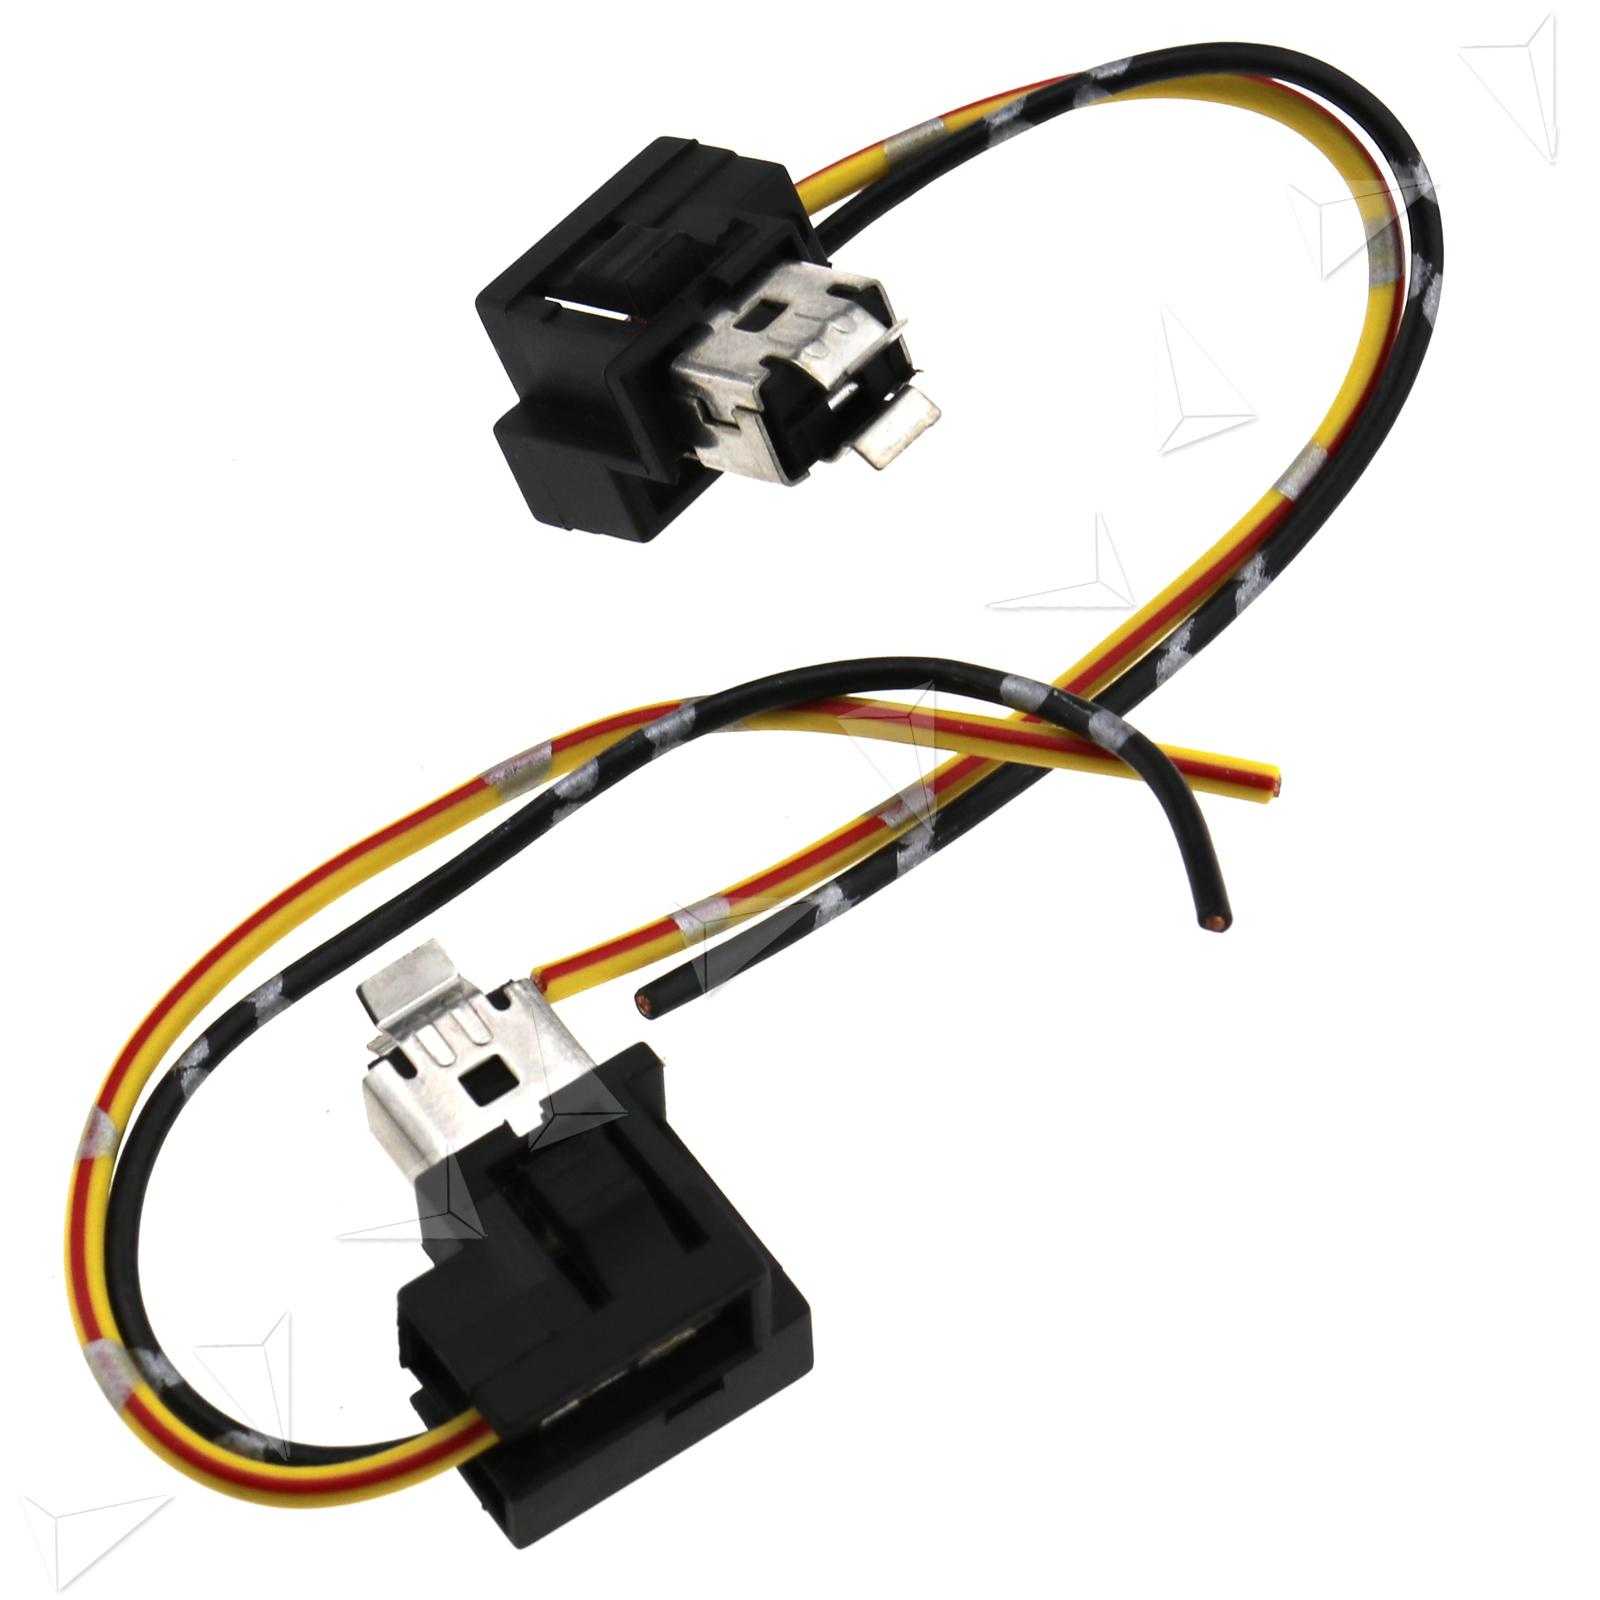 H1 Headlight Fog Lamp Bulb Socket Holder Wiring Connector Plug For Lights To Auto Car